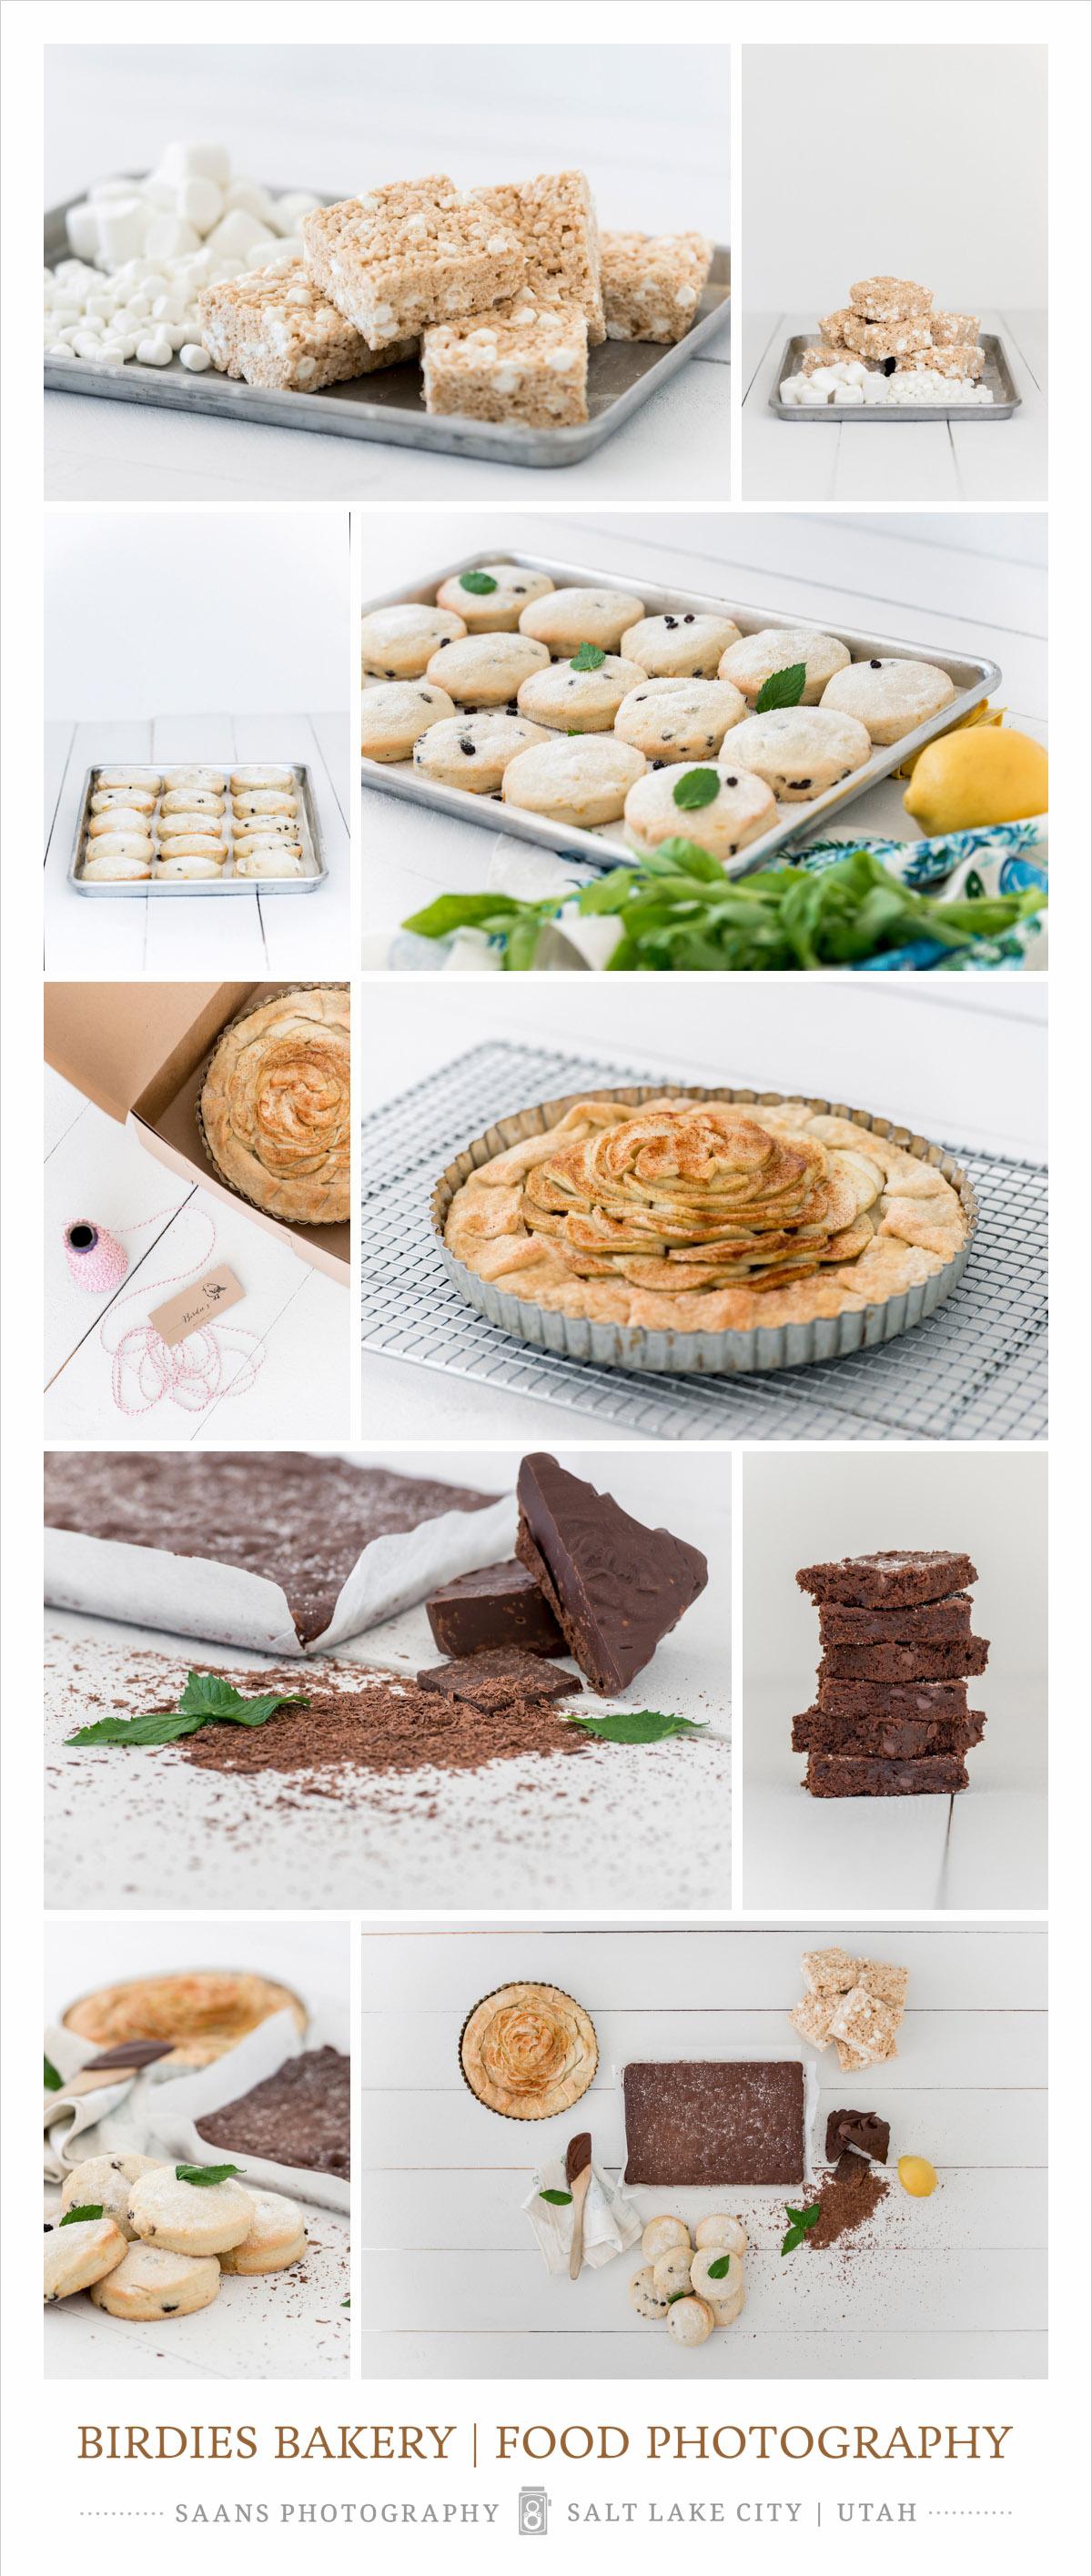 Birdies Bakery Blog